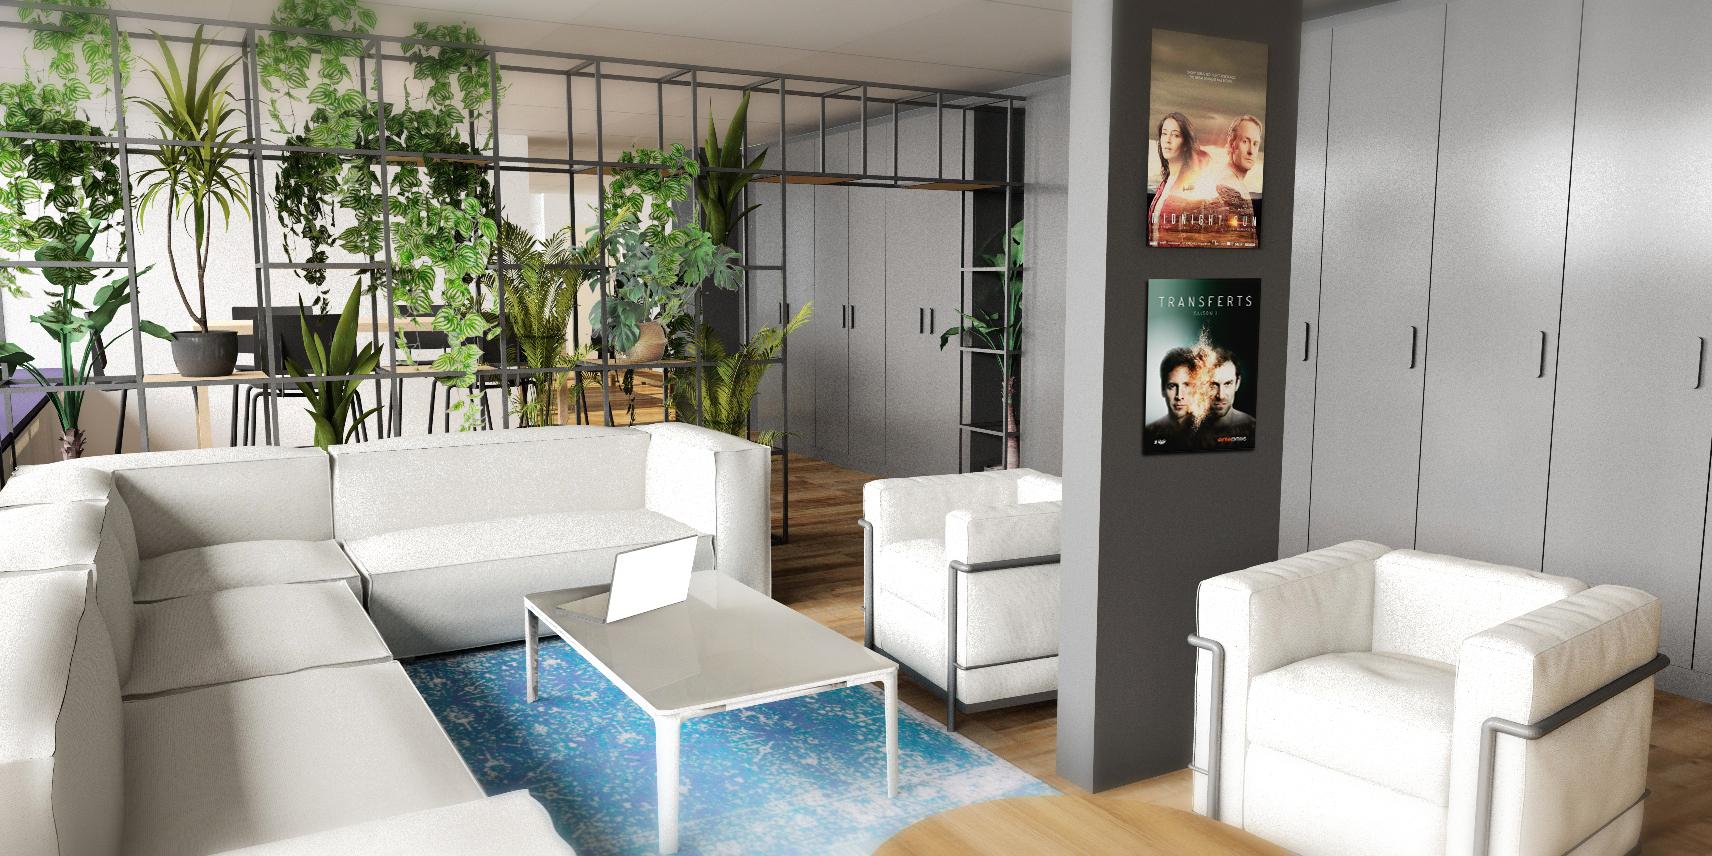 adv studio - nicolas vade - architecture interieur -lagardere 4.jpg